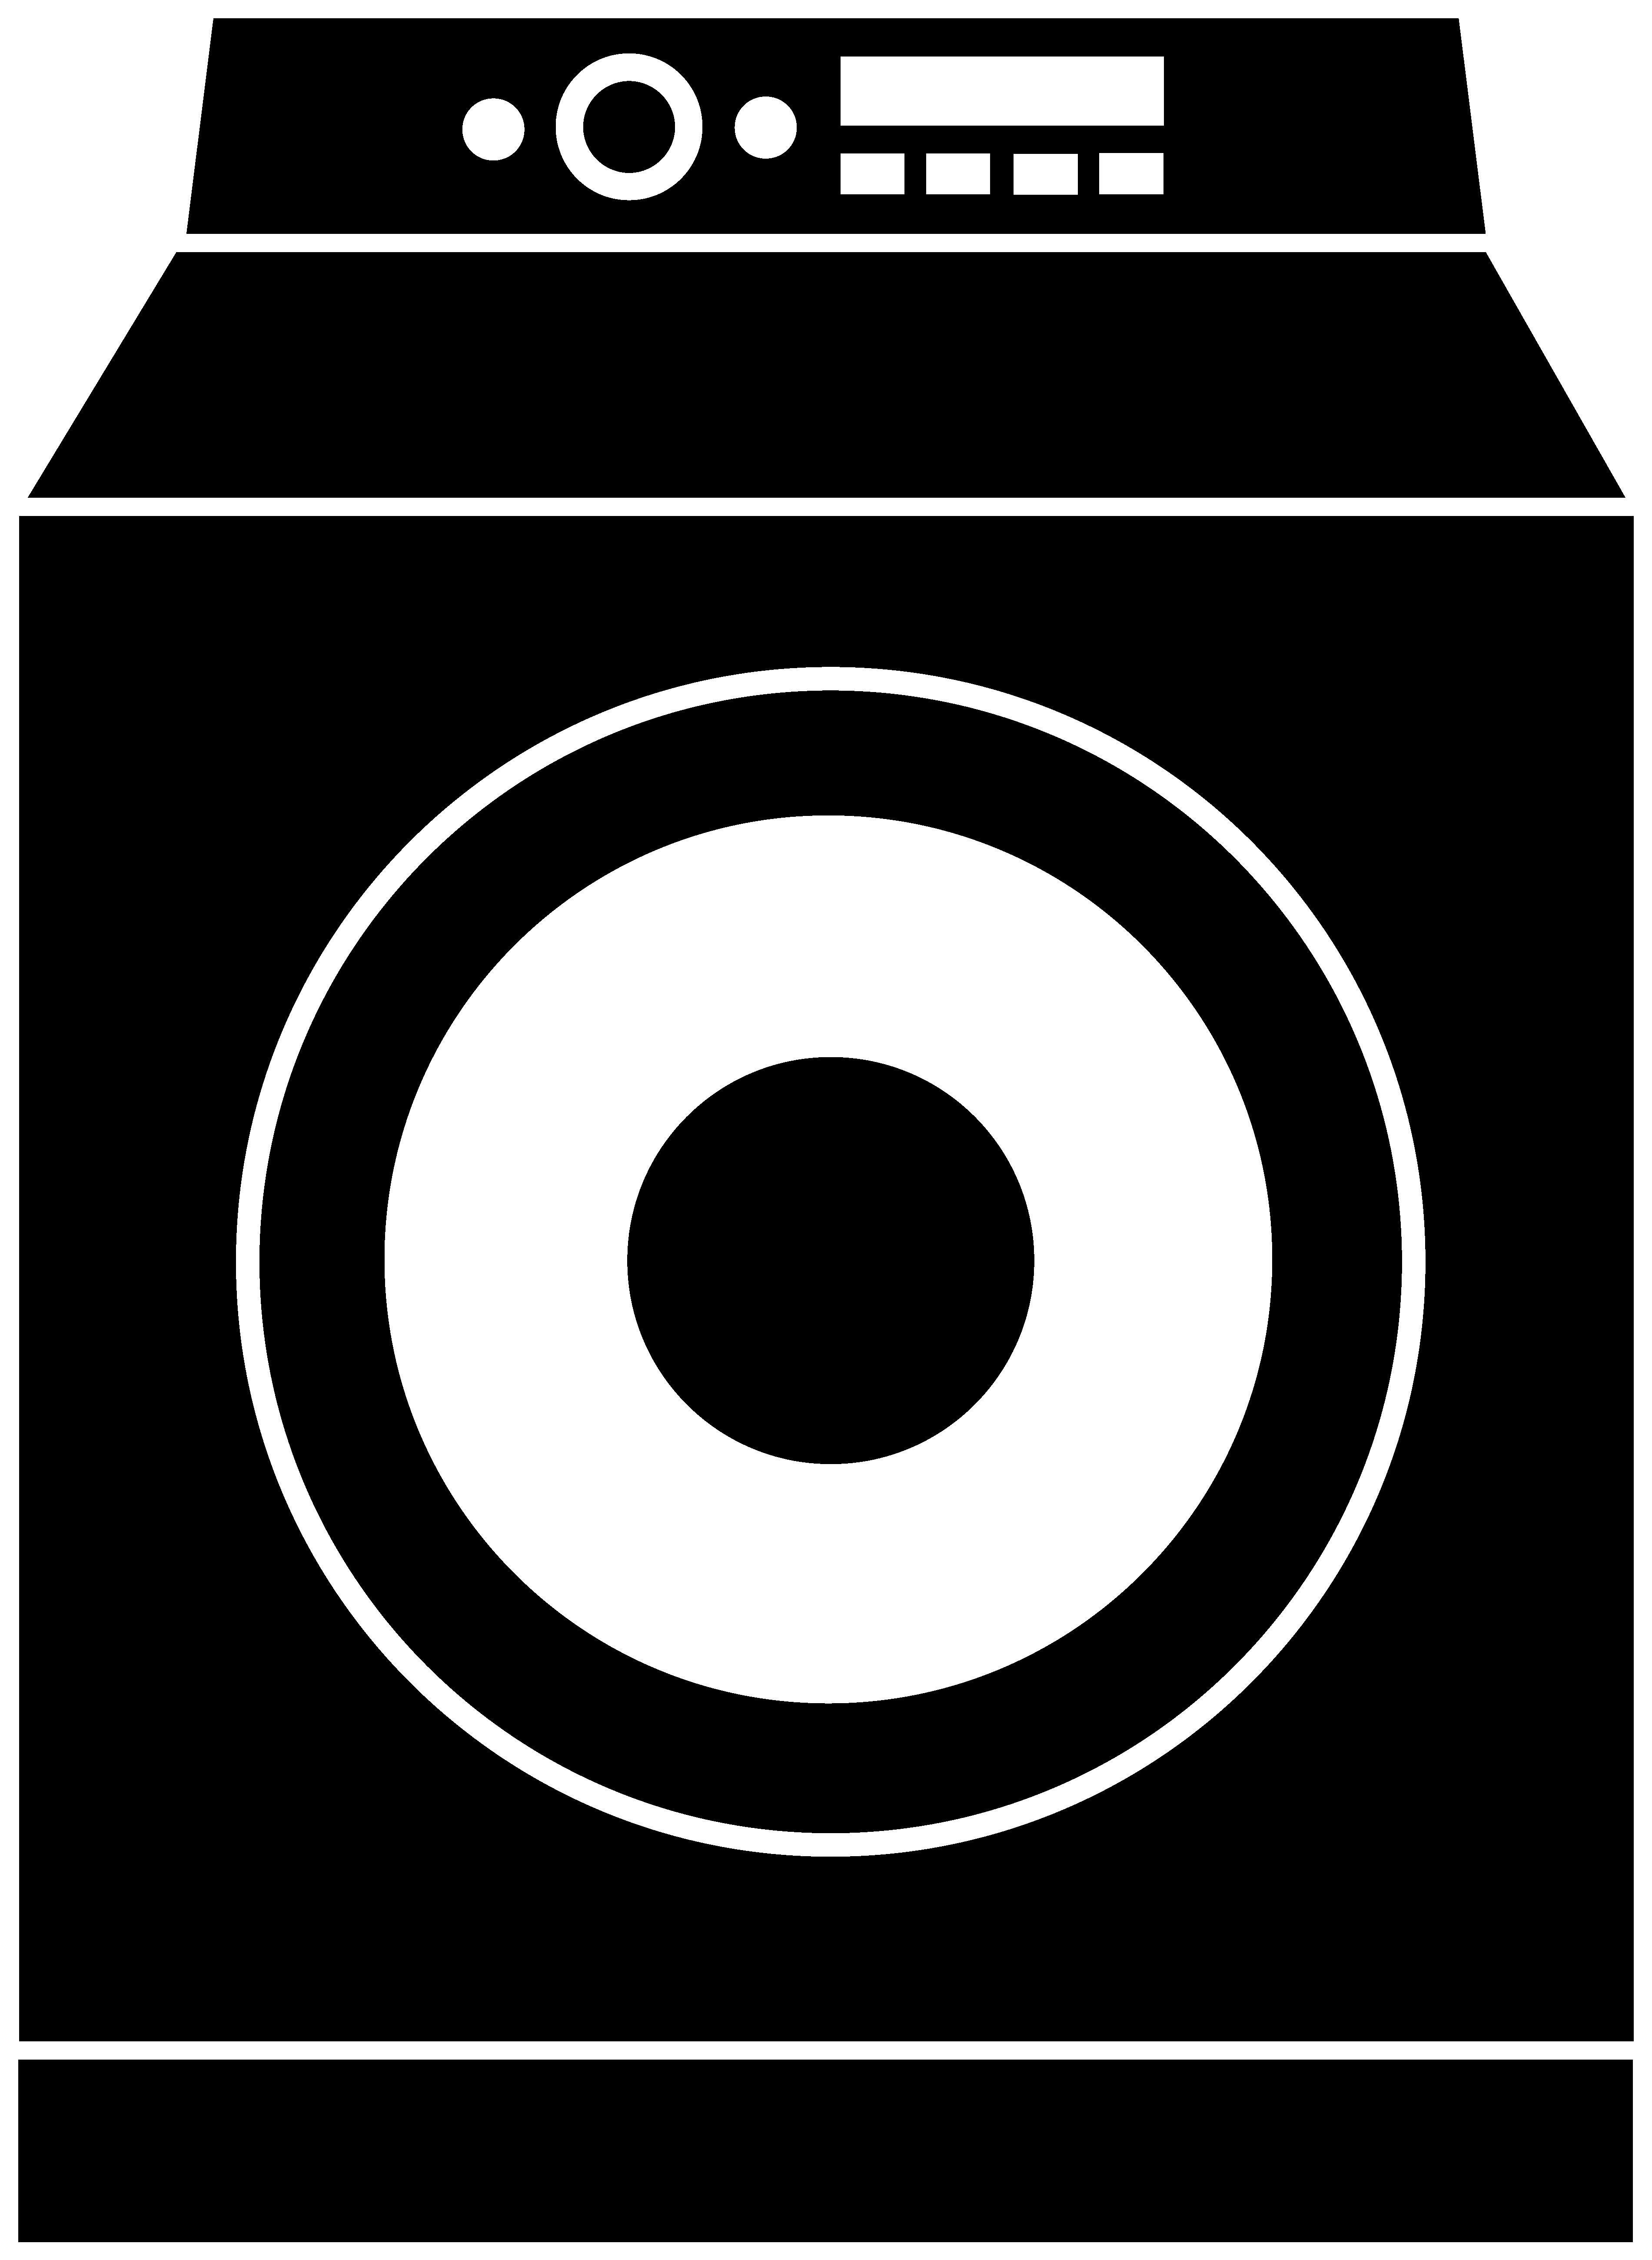 Washing machine clipart images vector black and white stock Washing Machine Silhouette Logo - Free Clip Art vector black and white stock